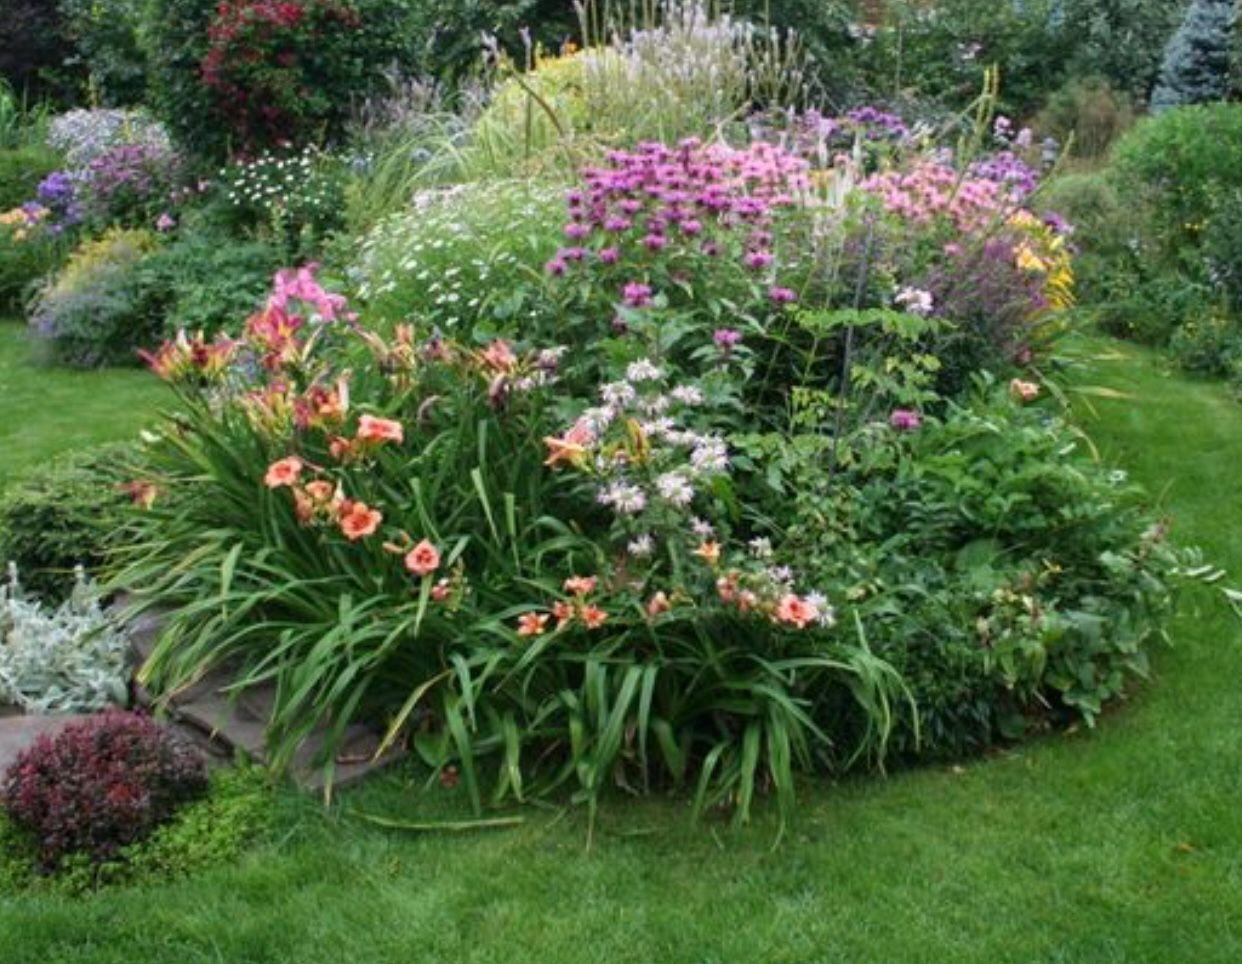 Pin By Gina Szczesny On Landscaping Garden Landscape Design Outdoor Flowers Garden Accents